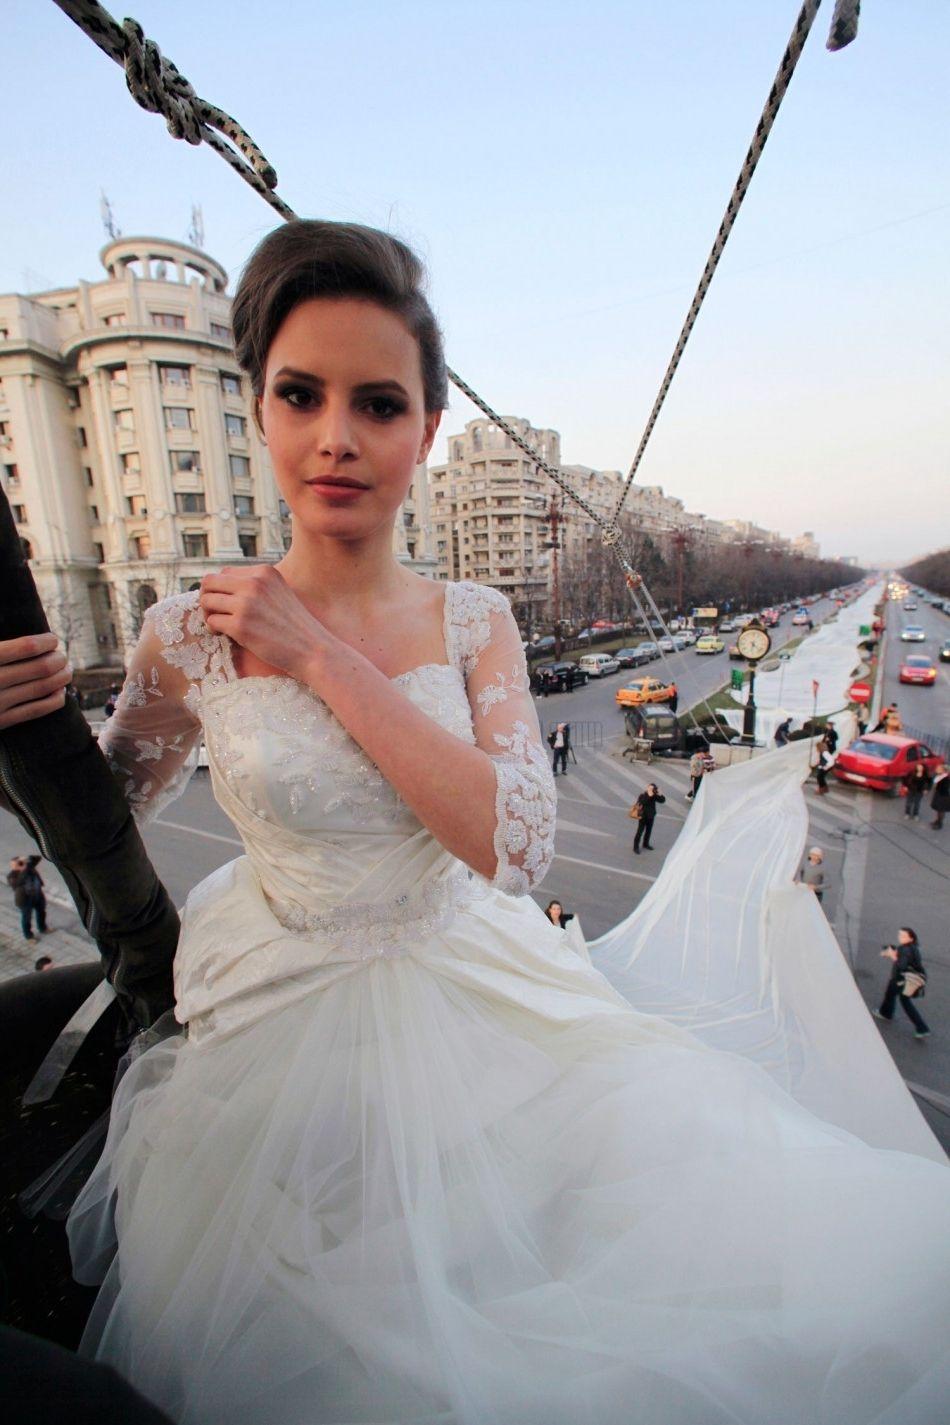 The Longest Wedding Gown